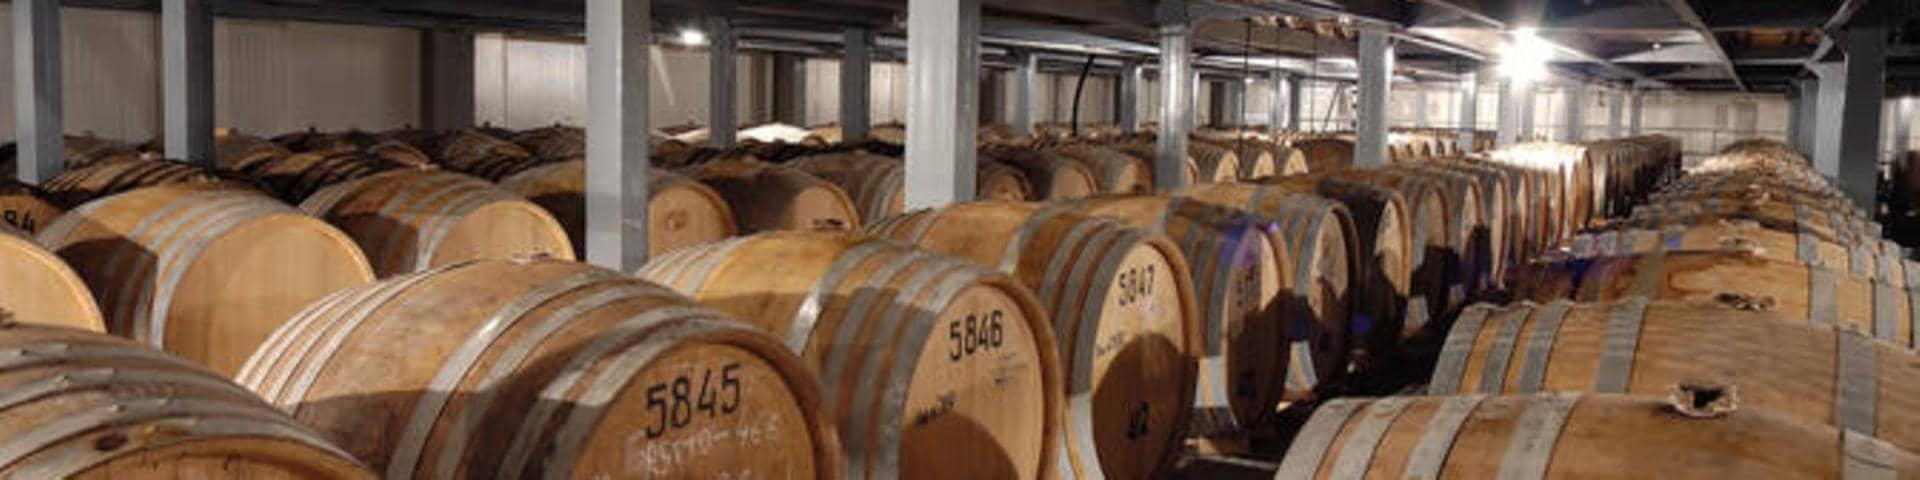 Industry Solutions Beverages Barrels